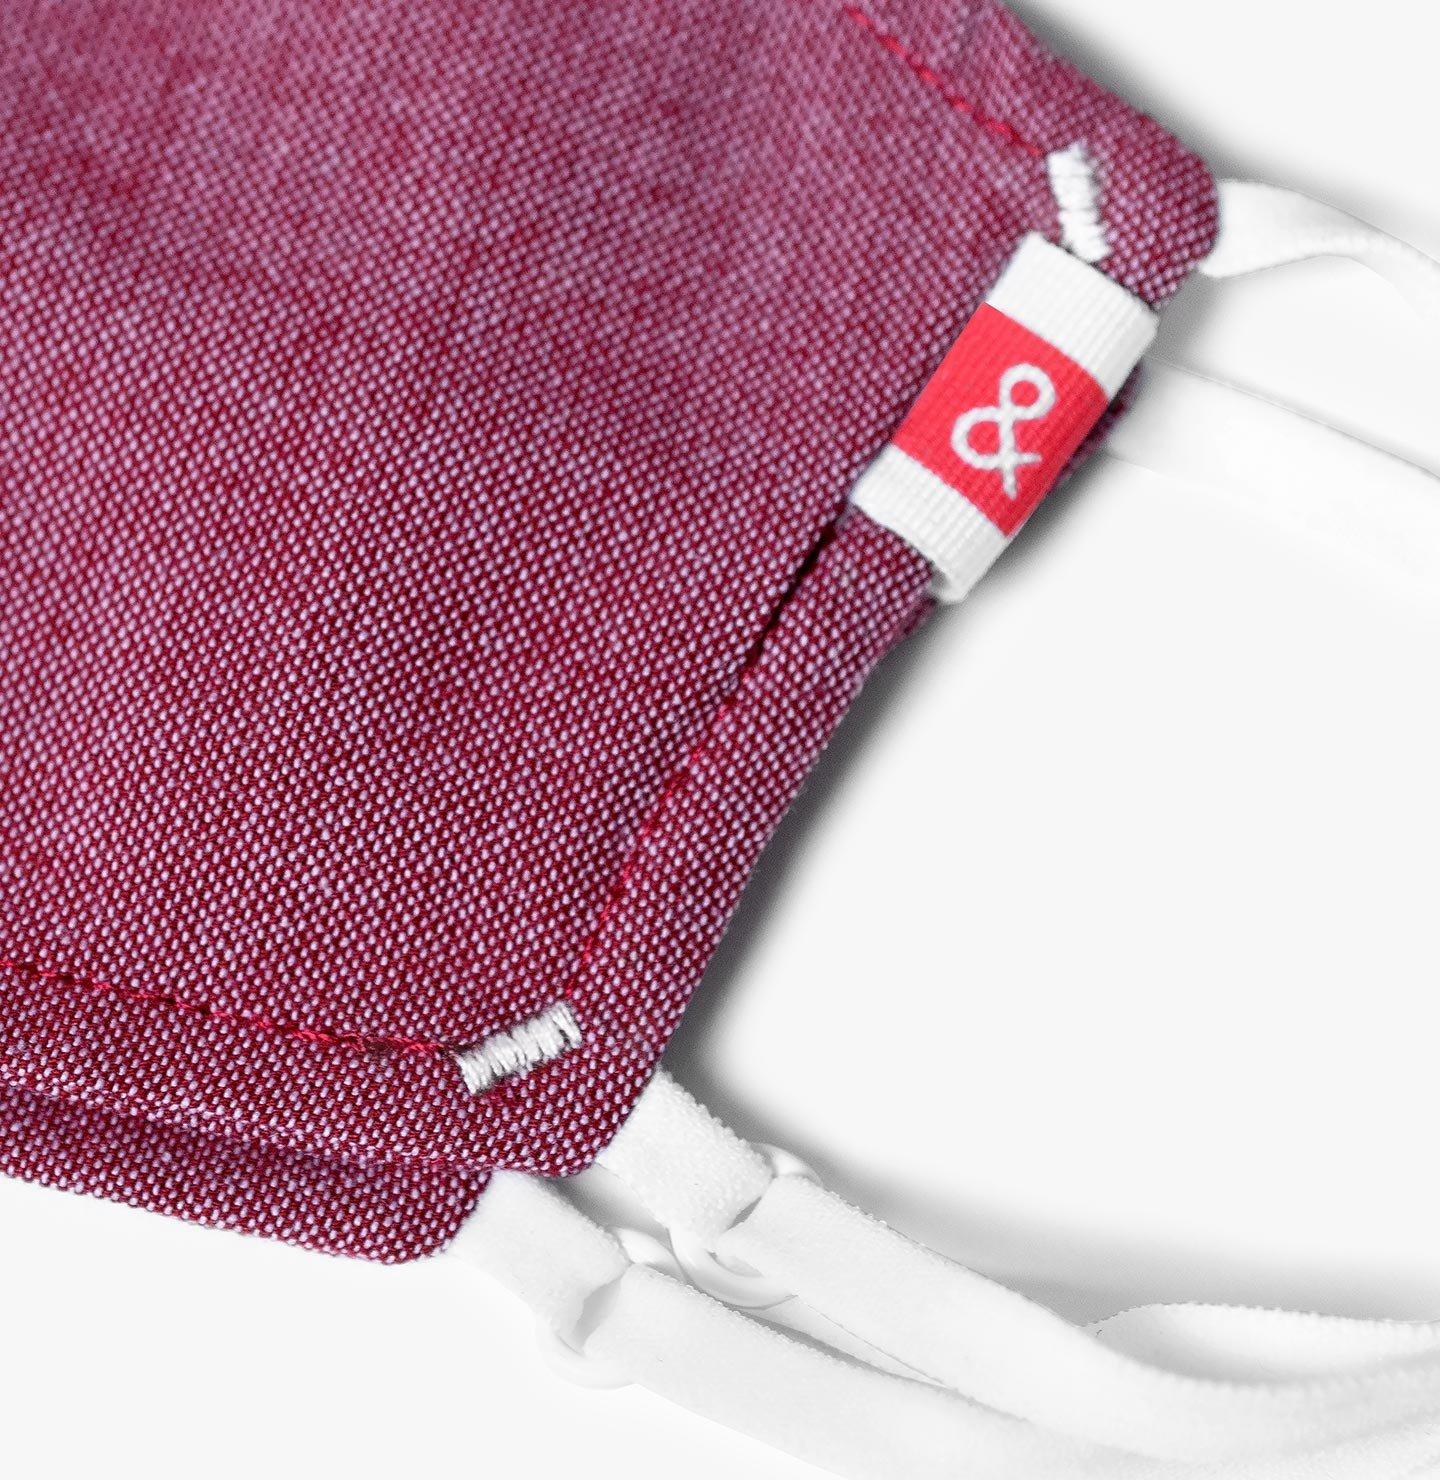 Reinforced Stitching